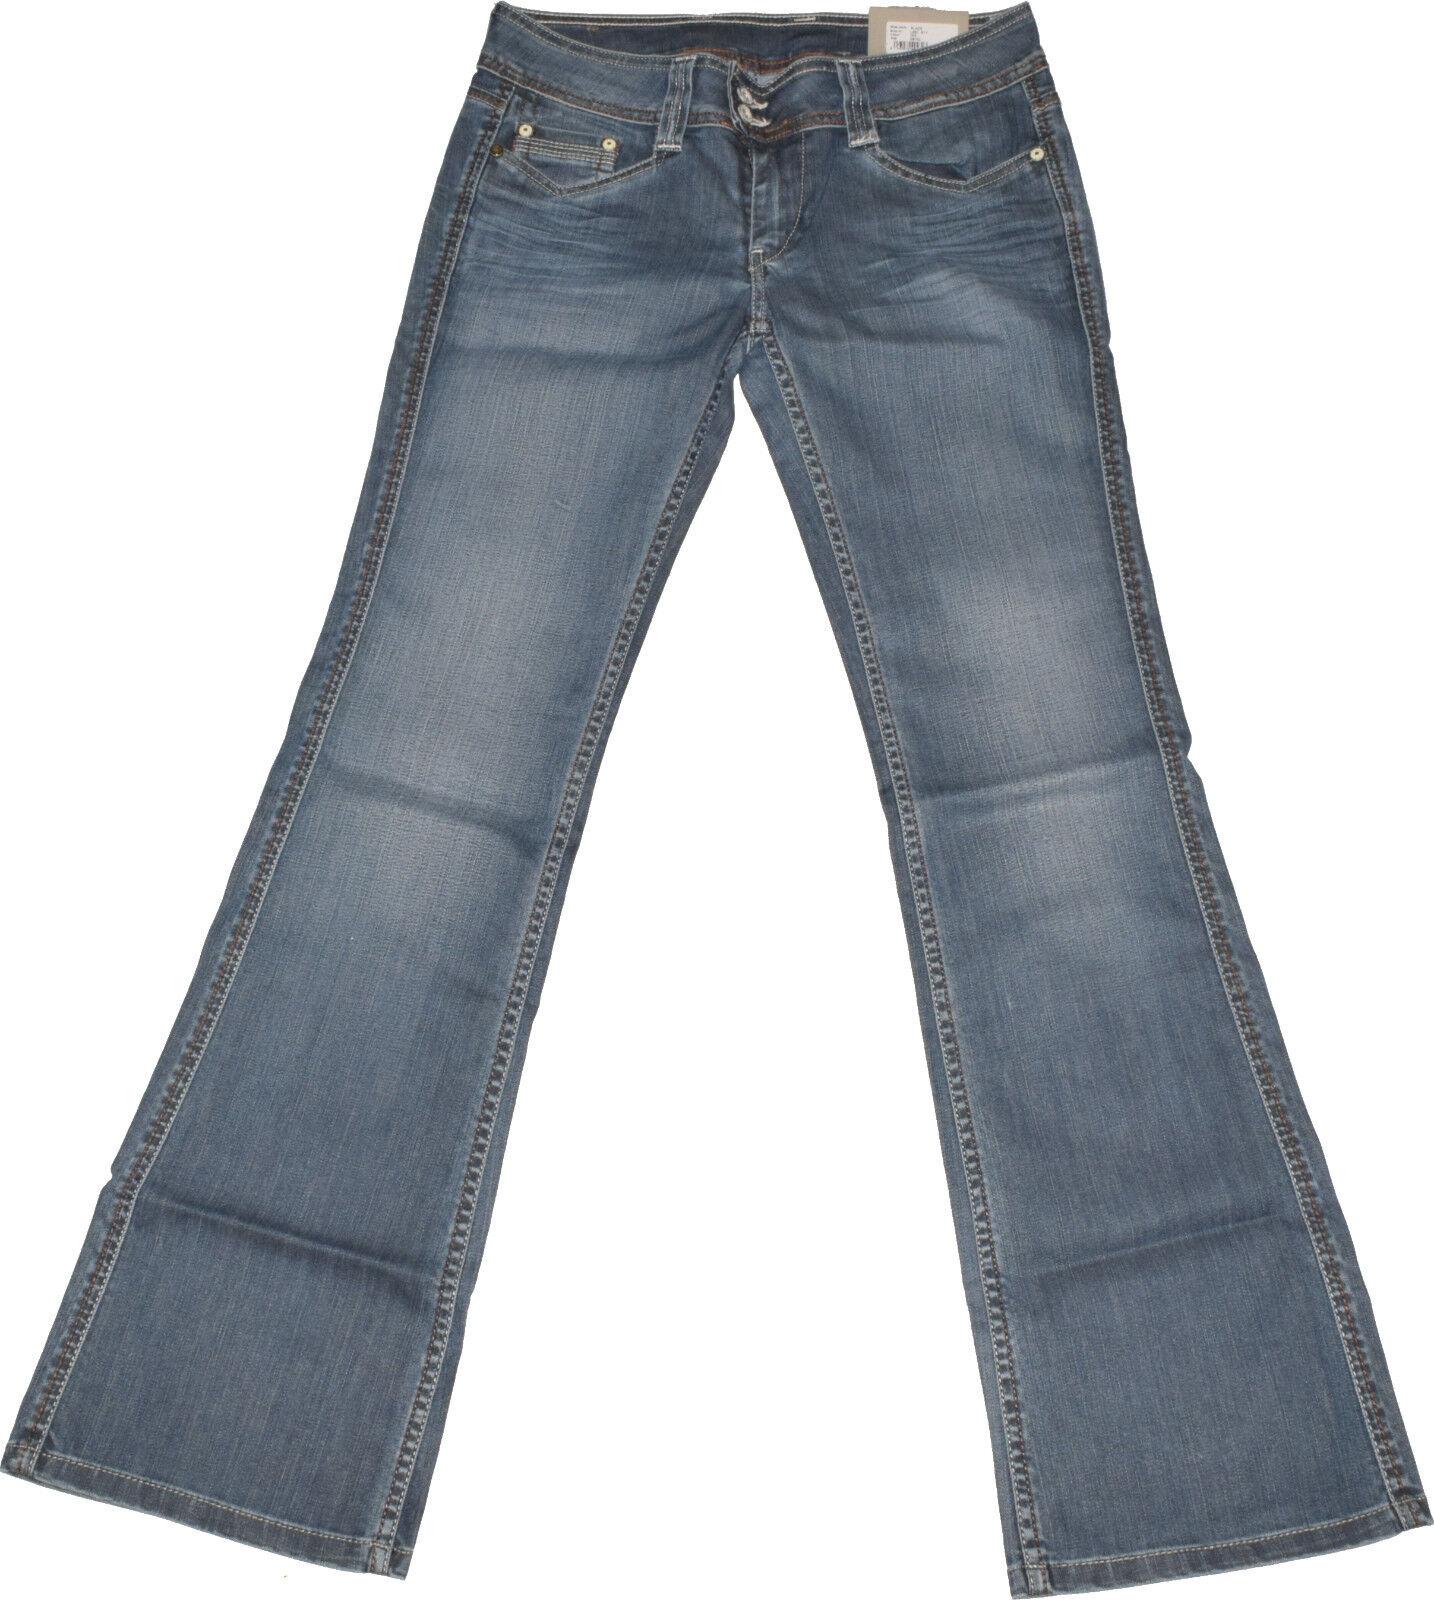 Pepe London  Blaze  Jeans  W28 L32  Stretch  Vintage  Stiefelcut  Used Look  NEU